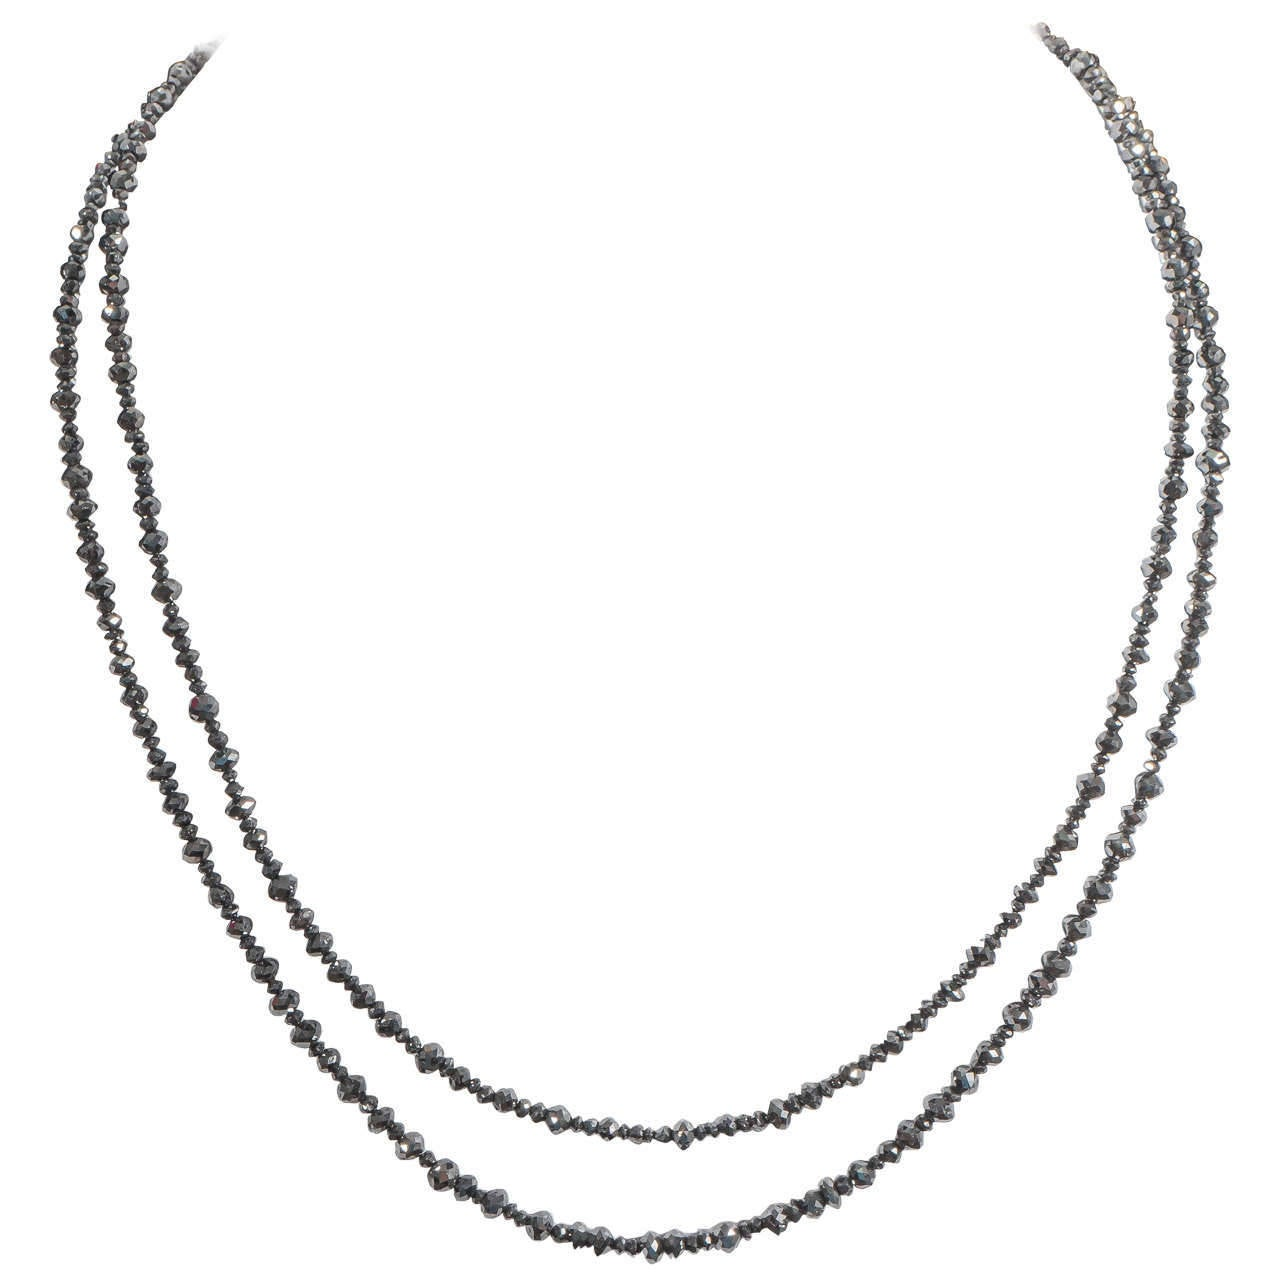 Naomi Sarna Two Strand Black Diamond Bead Necklace For Sale 4